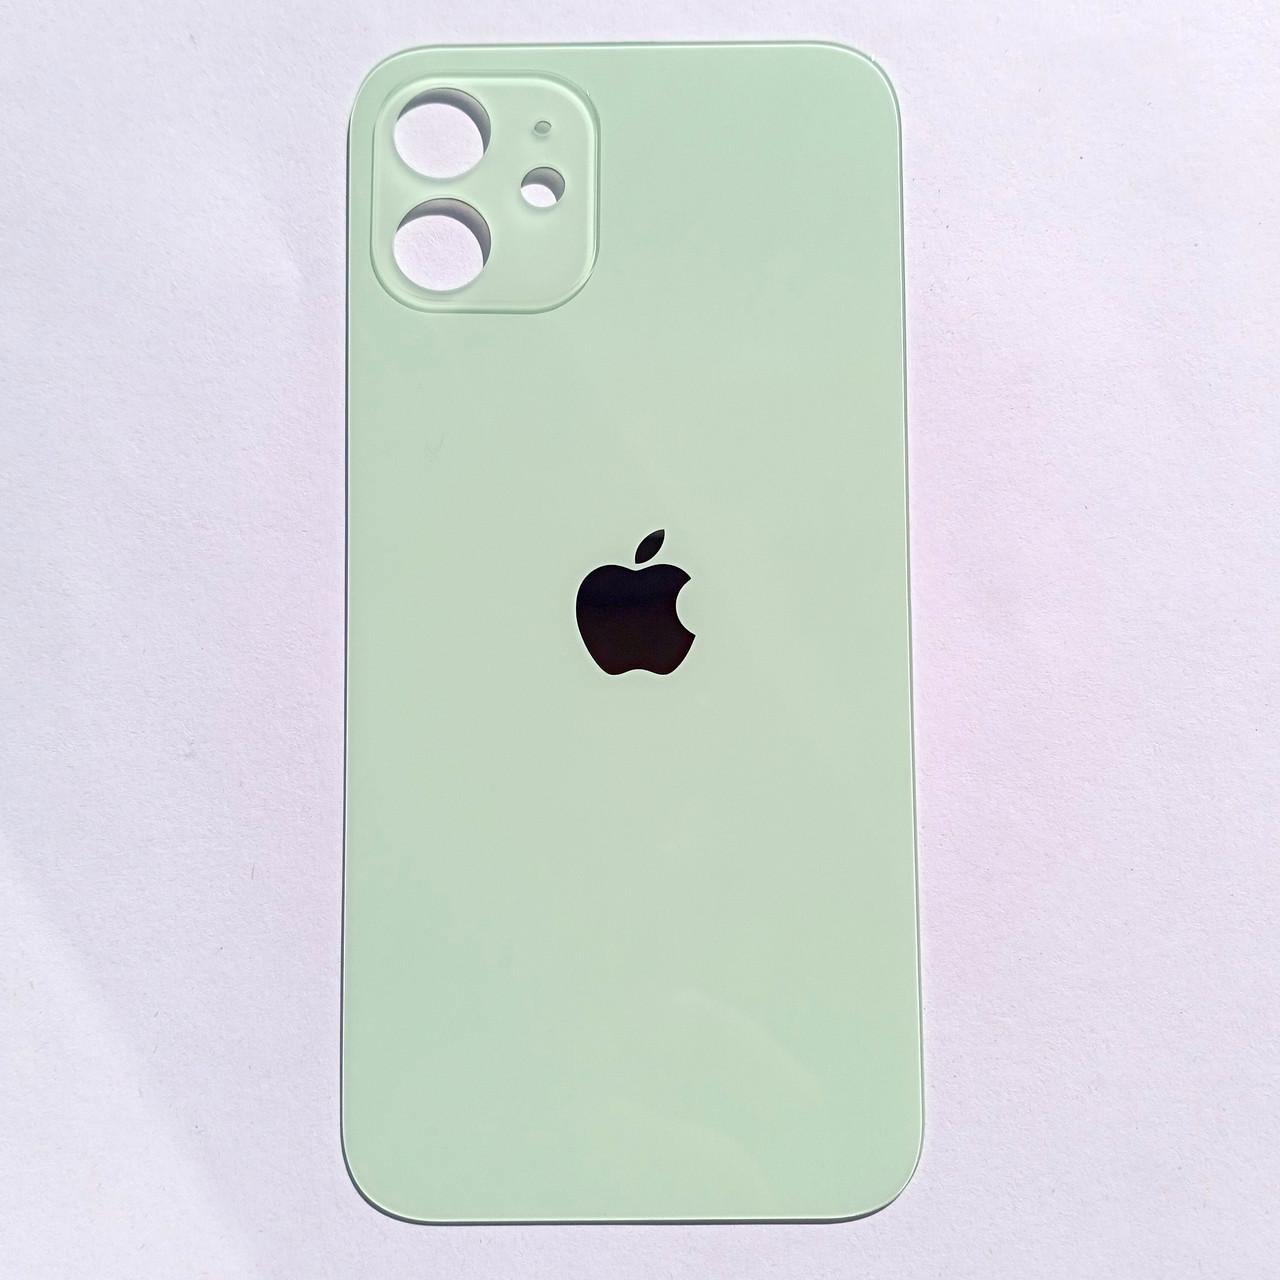 Задня панель корпусу Novael для Apple iPhone 12 Green Big Hole